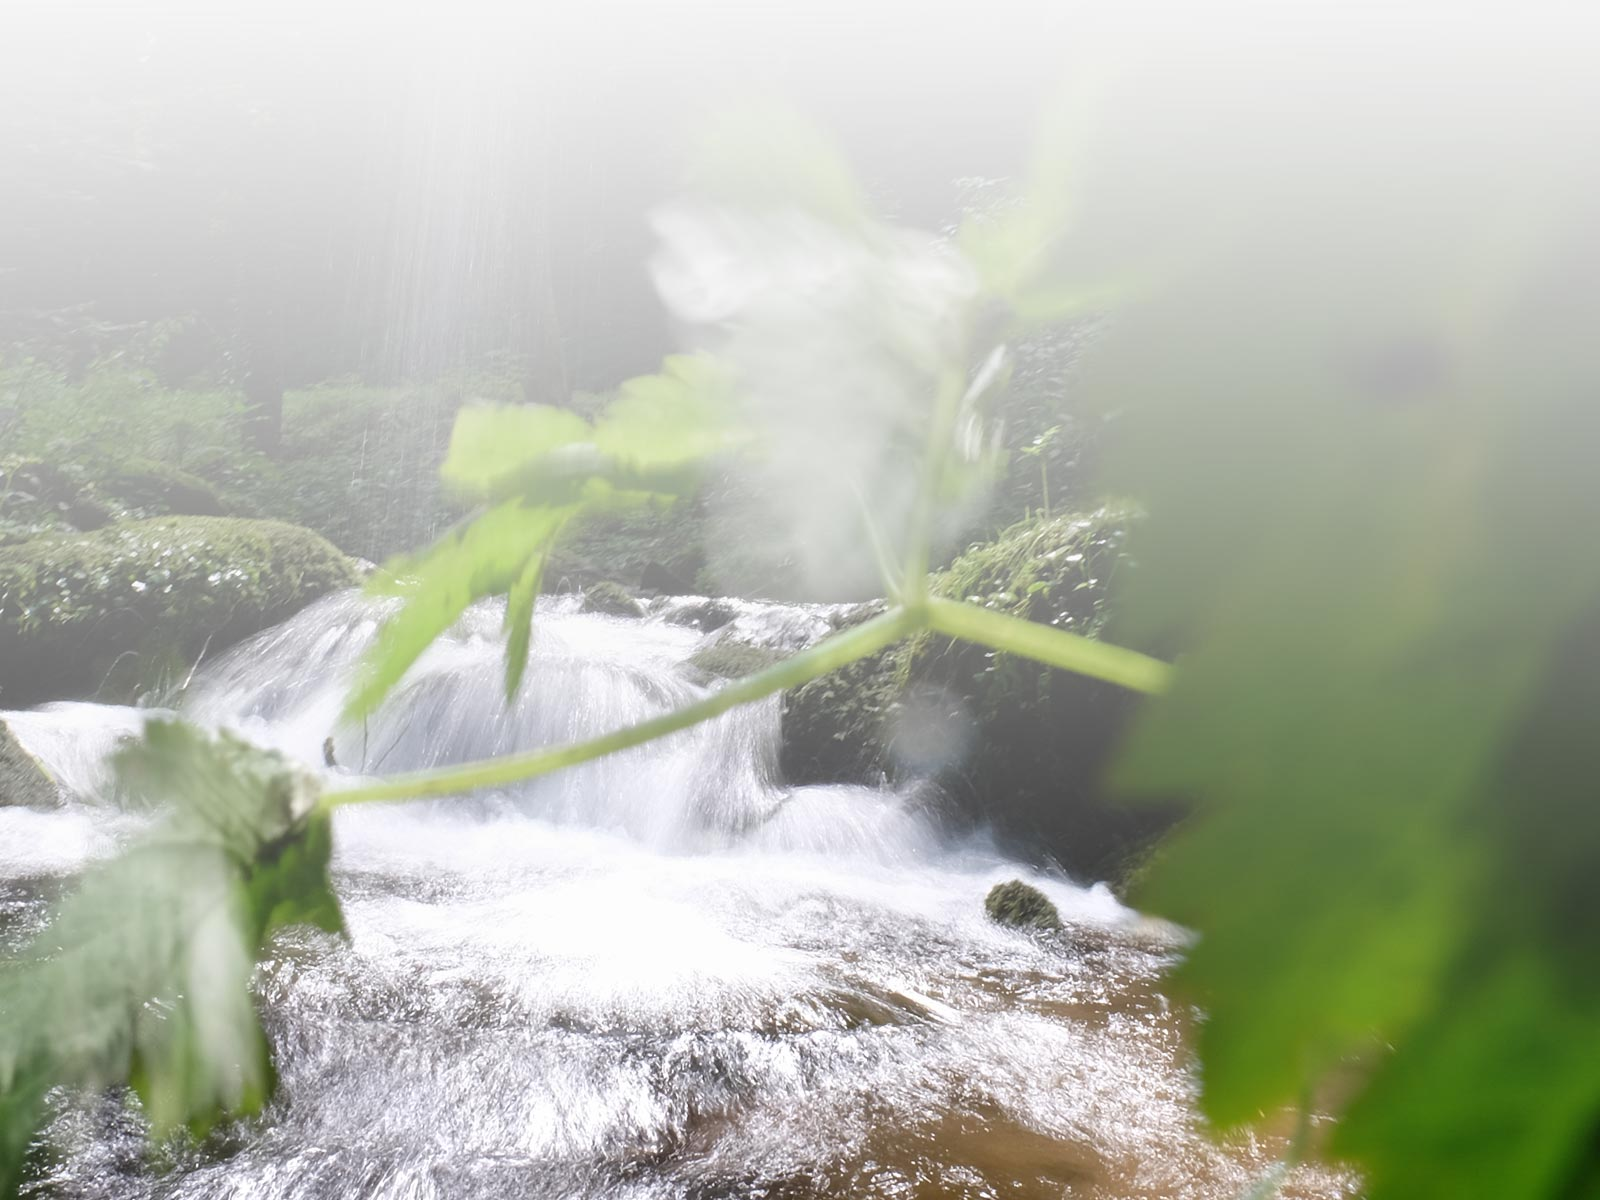 Carsharing Zukunft Teilen Natur Wasserfall 1